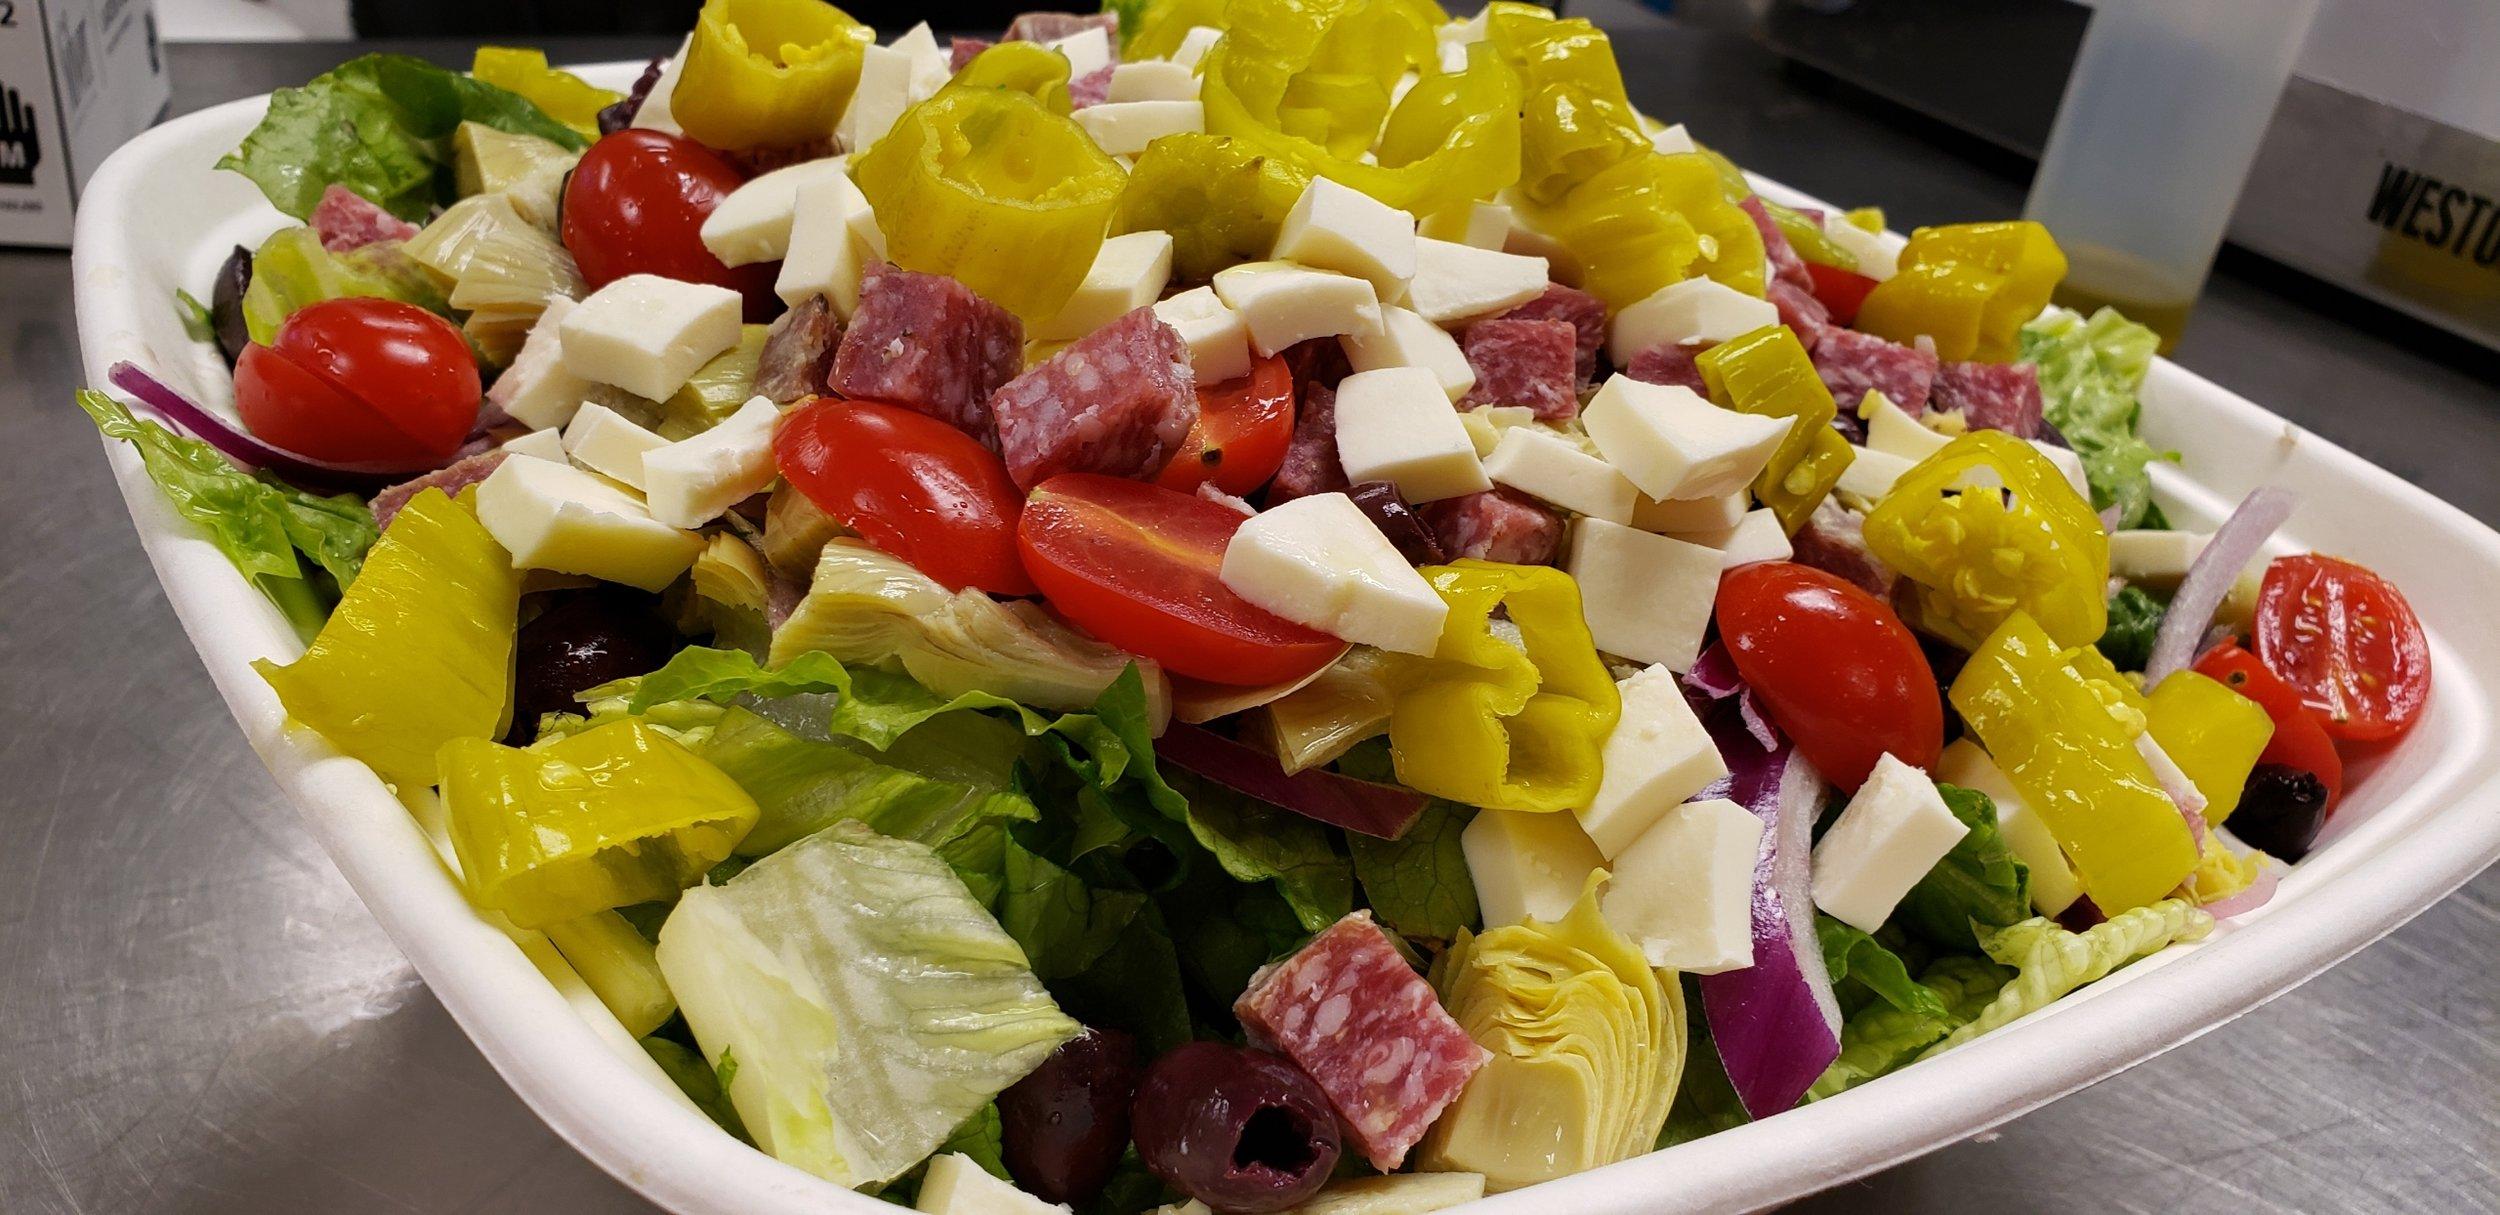 anti pasti salad.jpeg